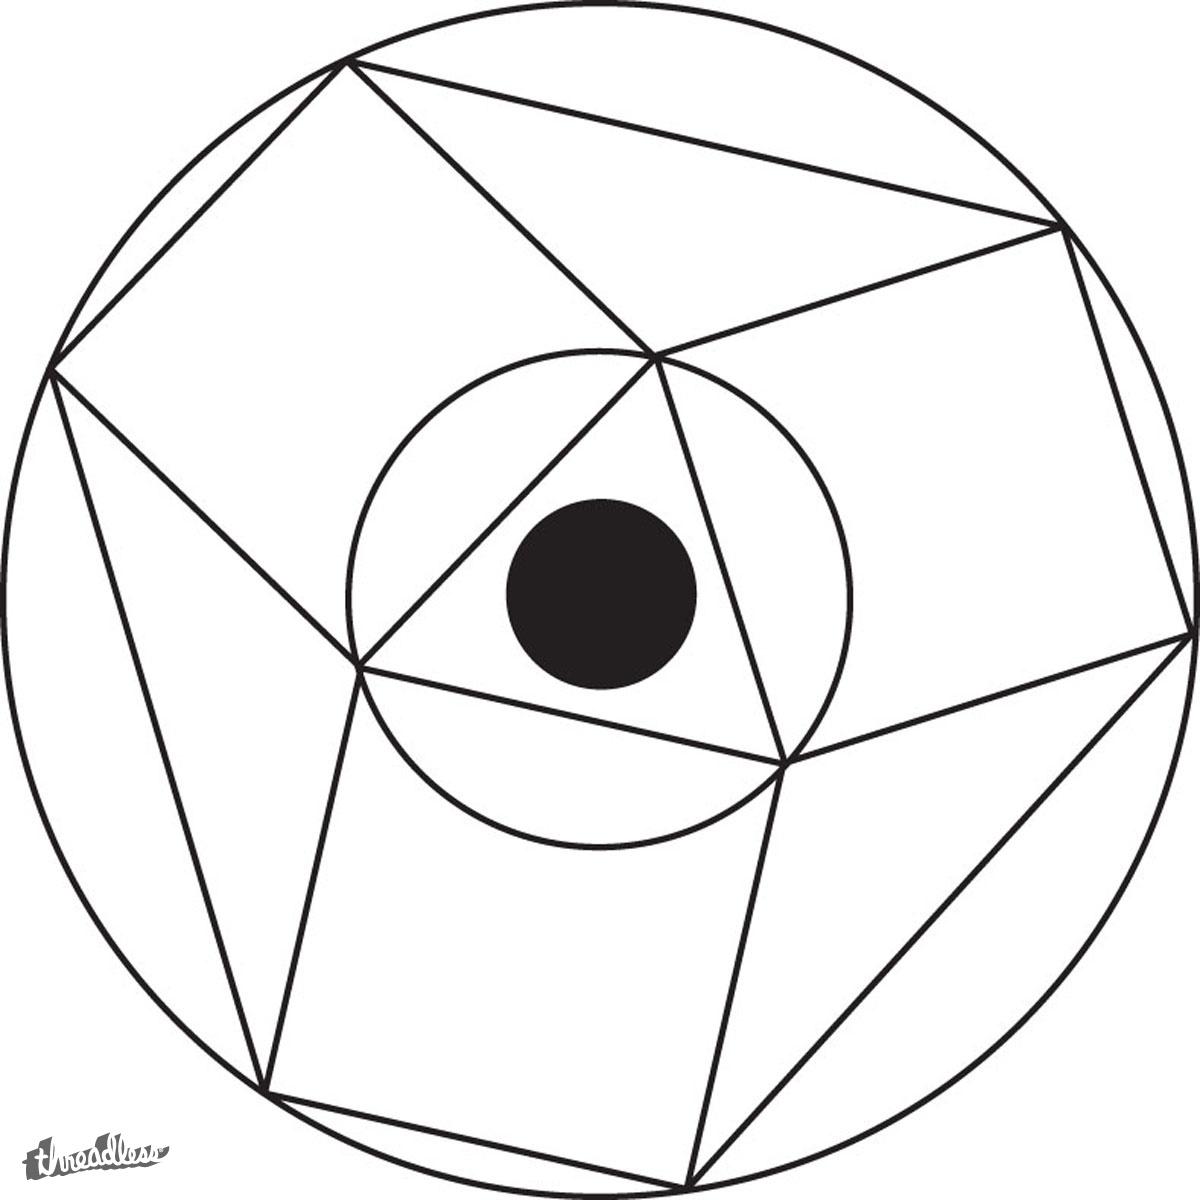 score atomic lifier by jhaberman on threadless Beach Ball atomic lifier by jhaberman on threadless